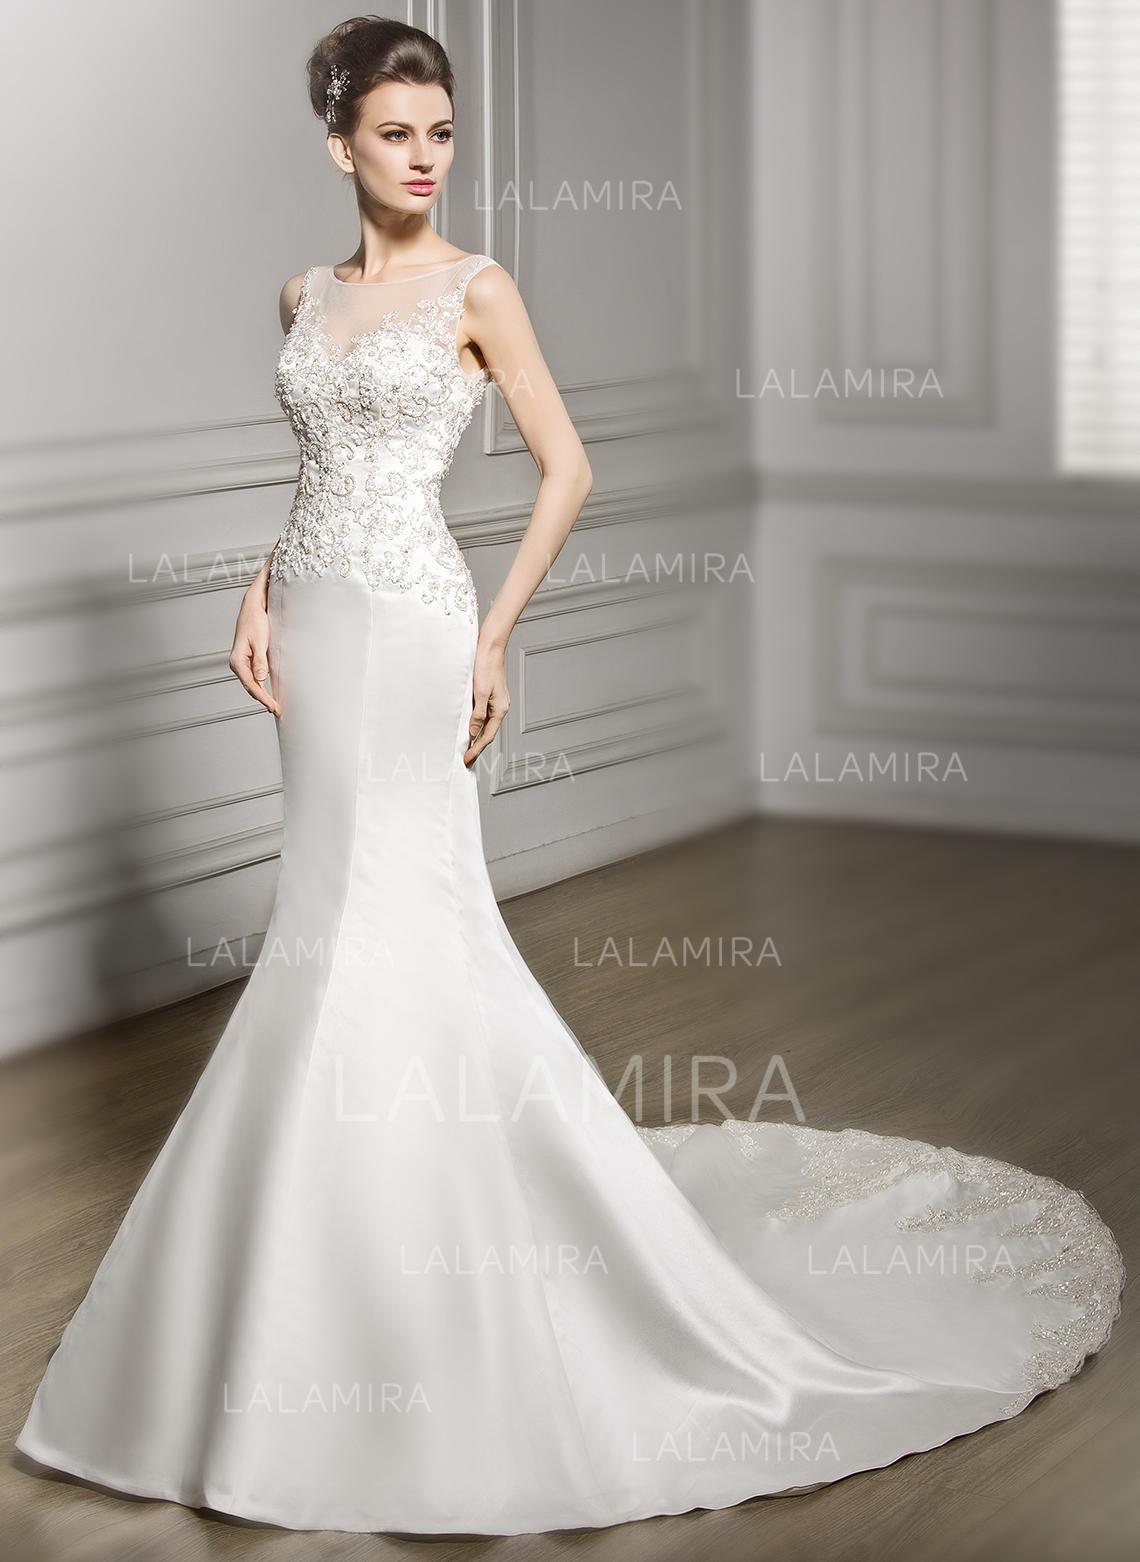 Scoop Trumpetmermaid Wedding Dresses Satin Lace Beading Sequins